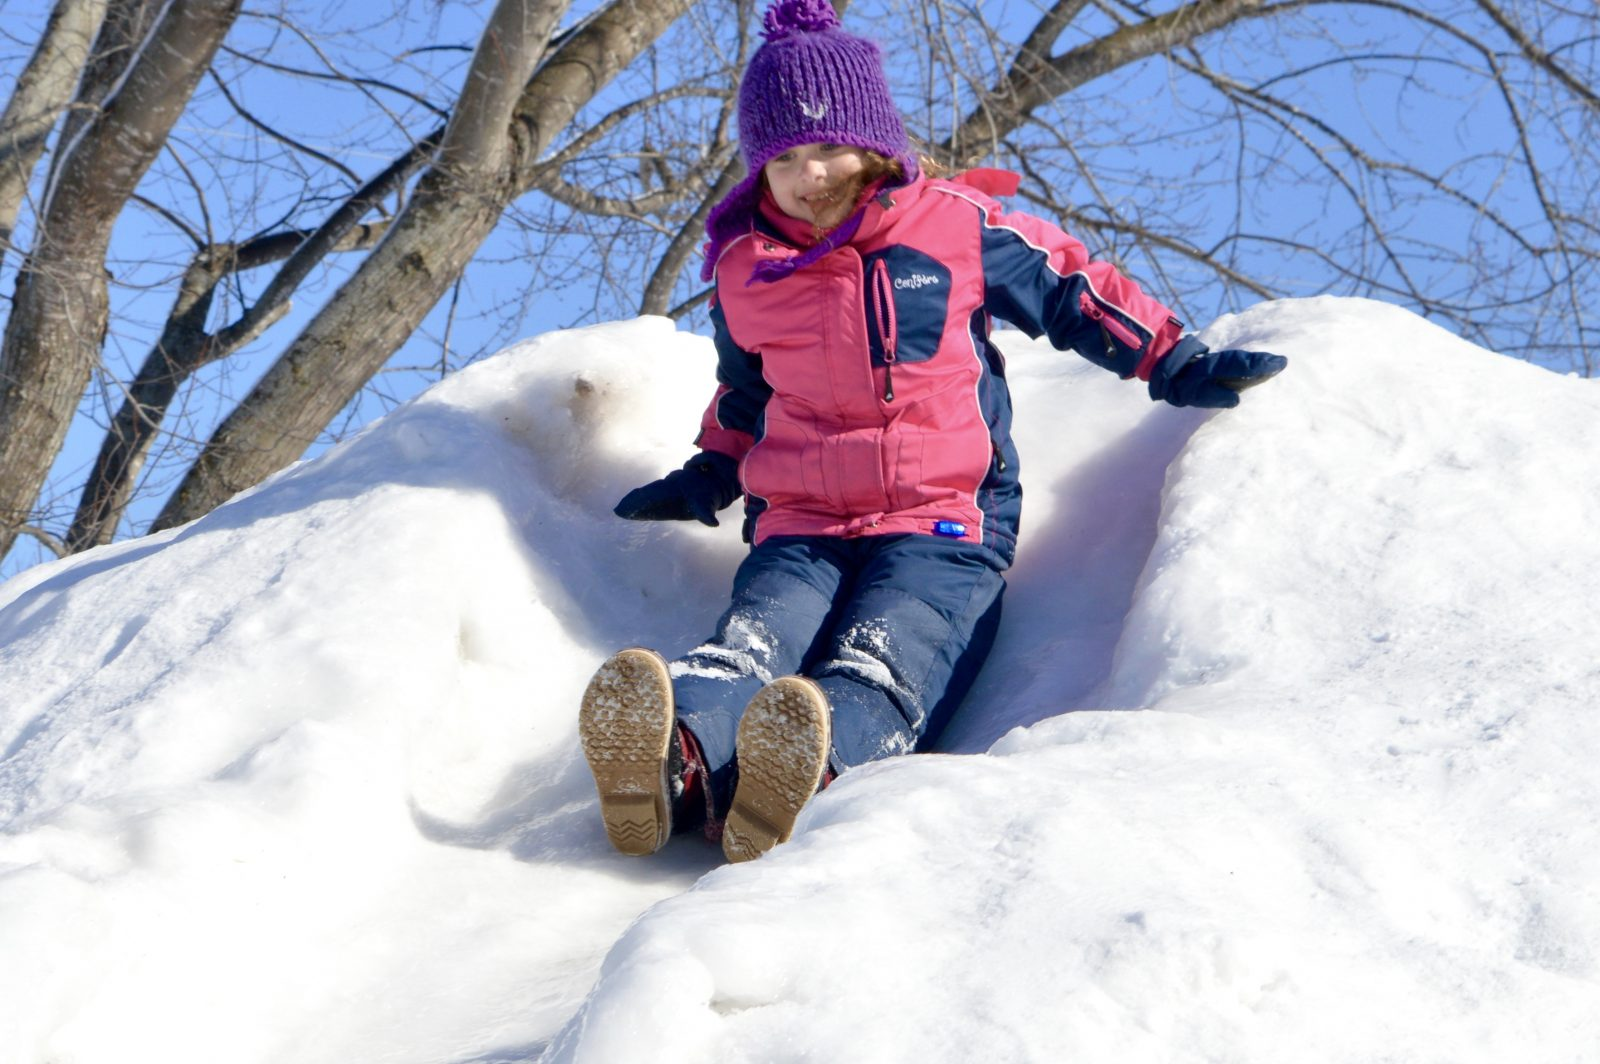 SLIDESHOW: Kilt Skate expands into Scottish winter carnival